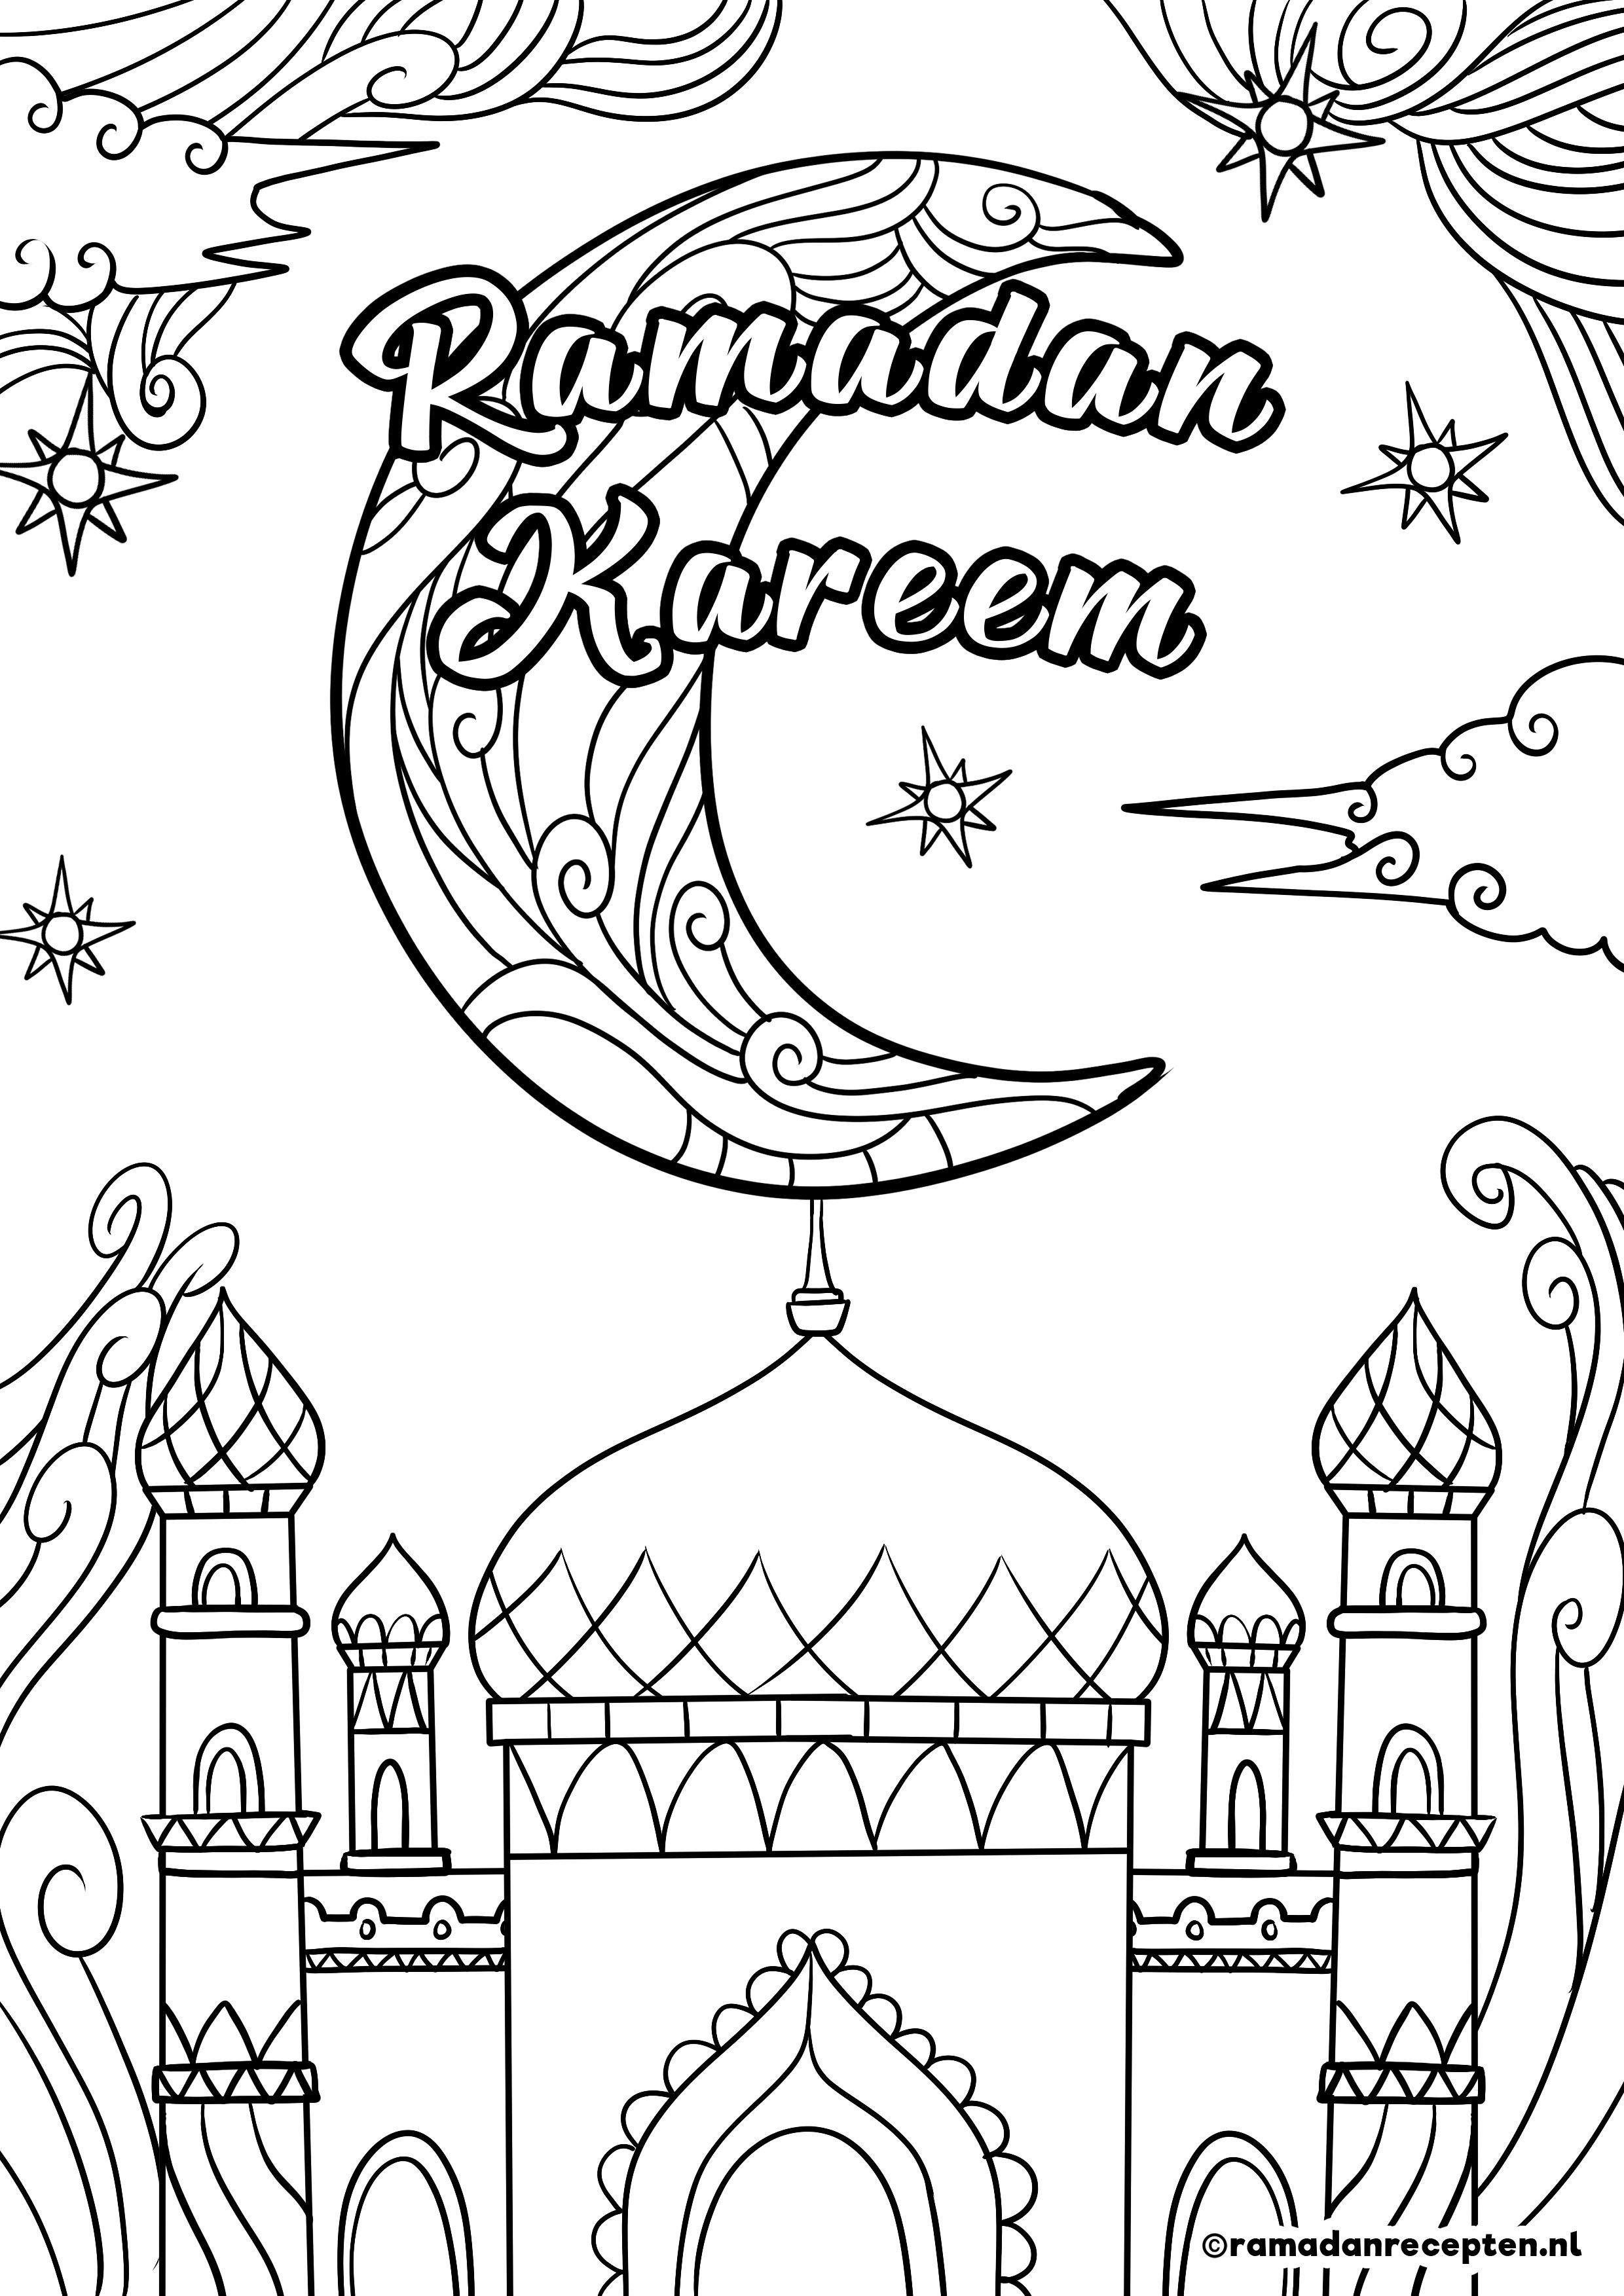 Free Printable 6 Ramadan Coloring Sheets For Kids 6 Ramadan Coloring Pages For Kids In 2021 Ramadan Kids Ramadan Printables Ramadan Activities